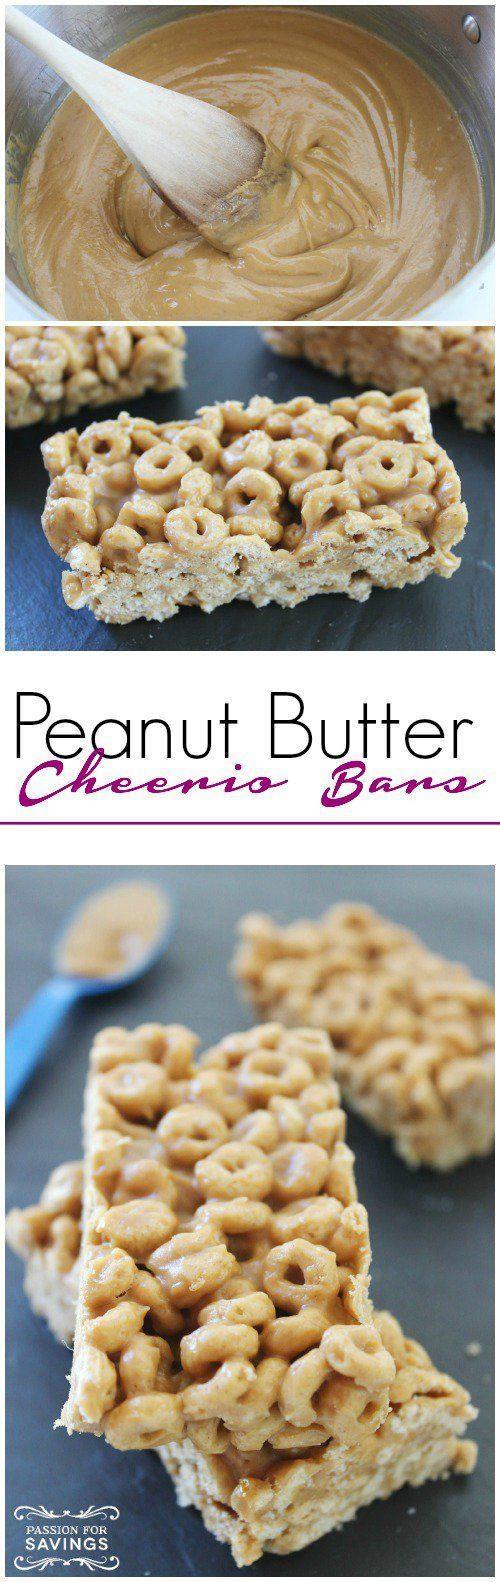 Diabetic Granola Bar Recipes  Best 25 Diabetic breakfast recipes ideas on Pinterest